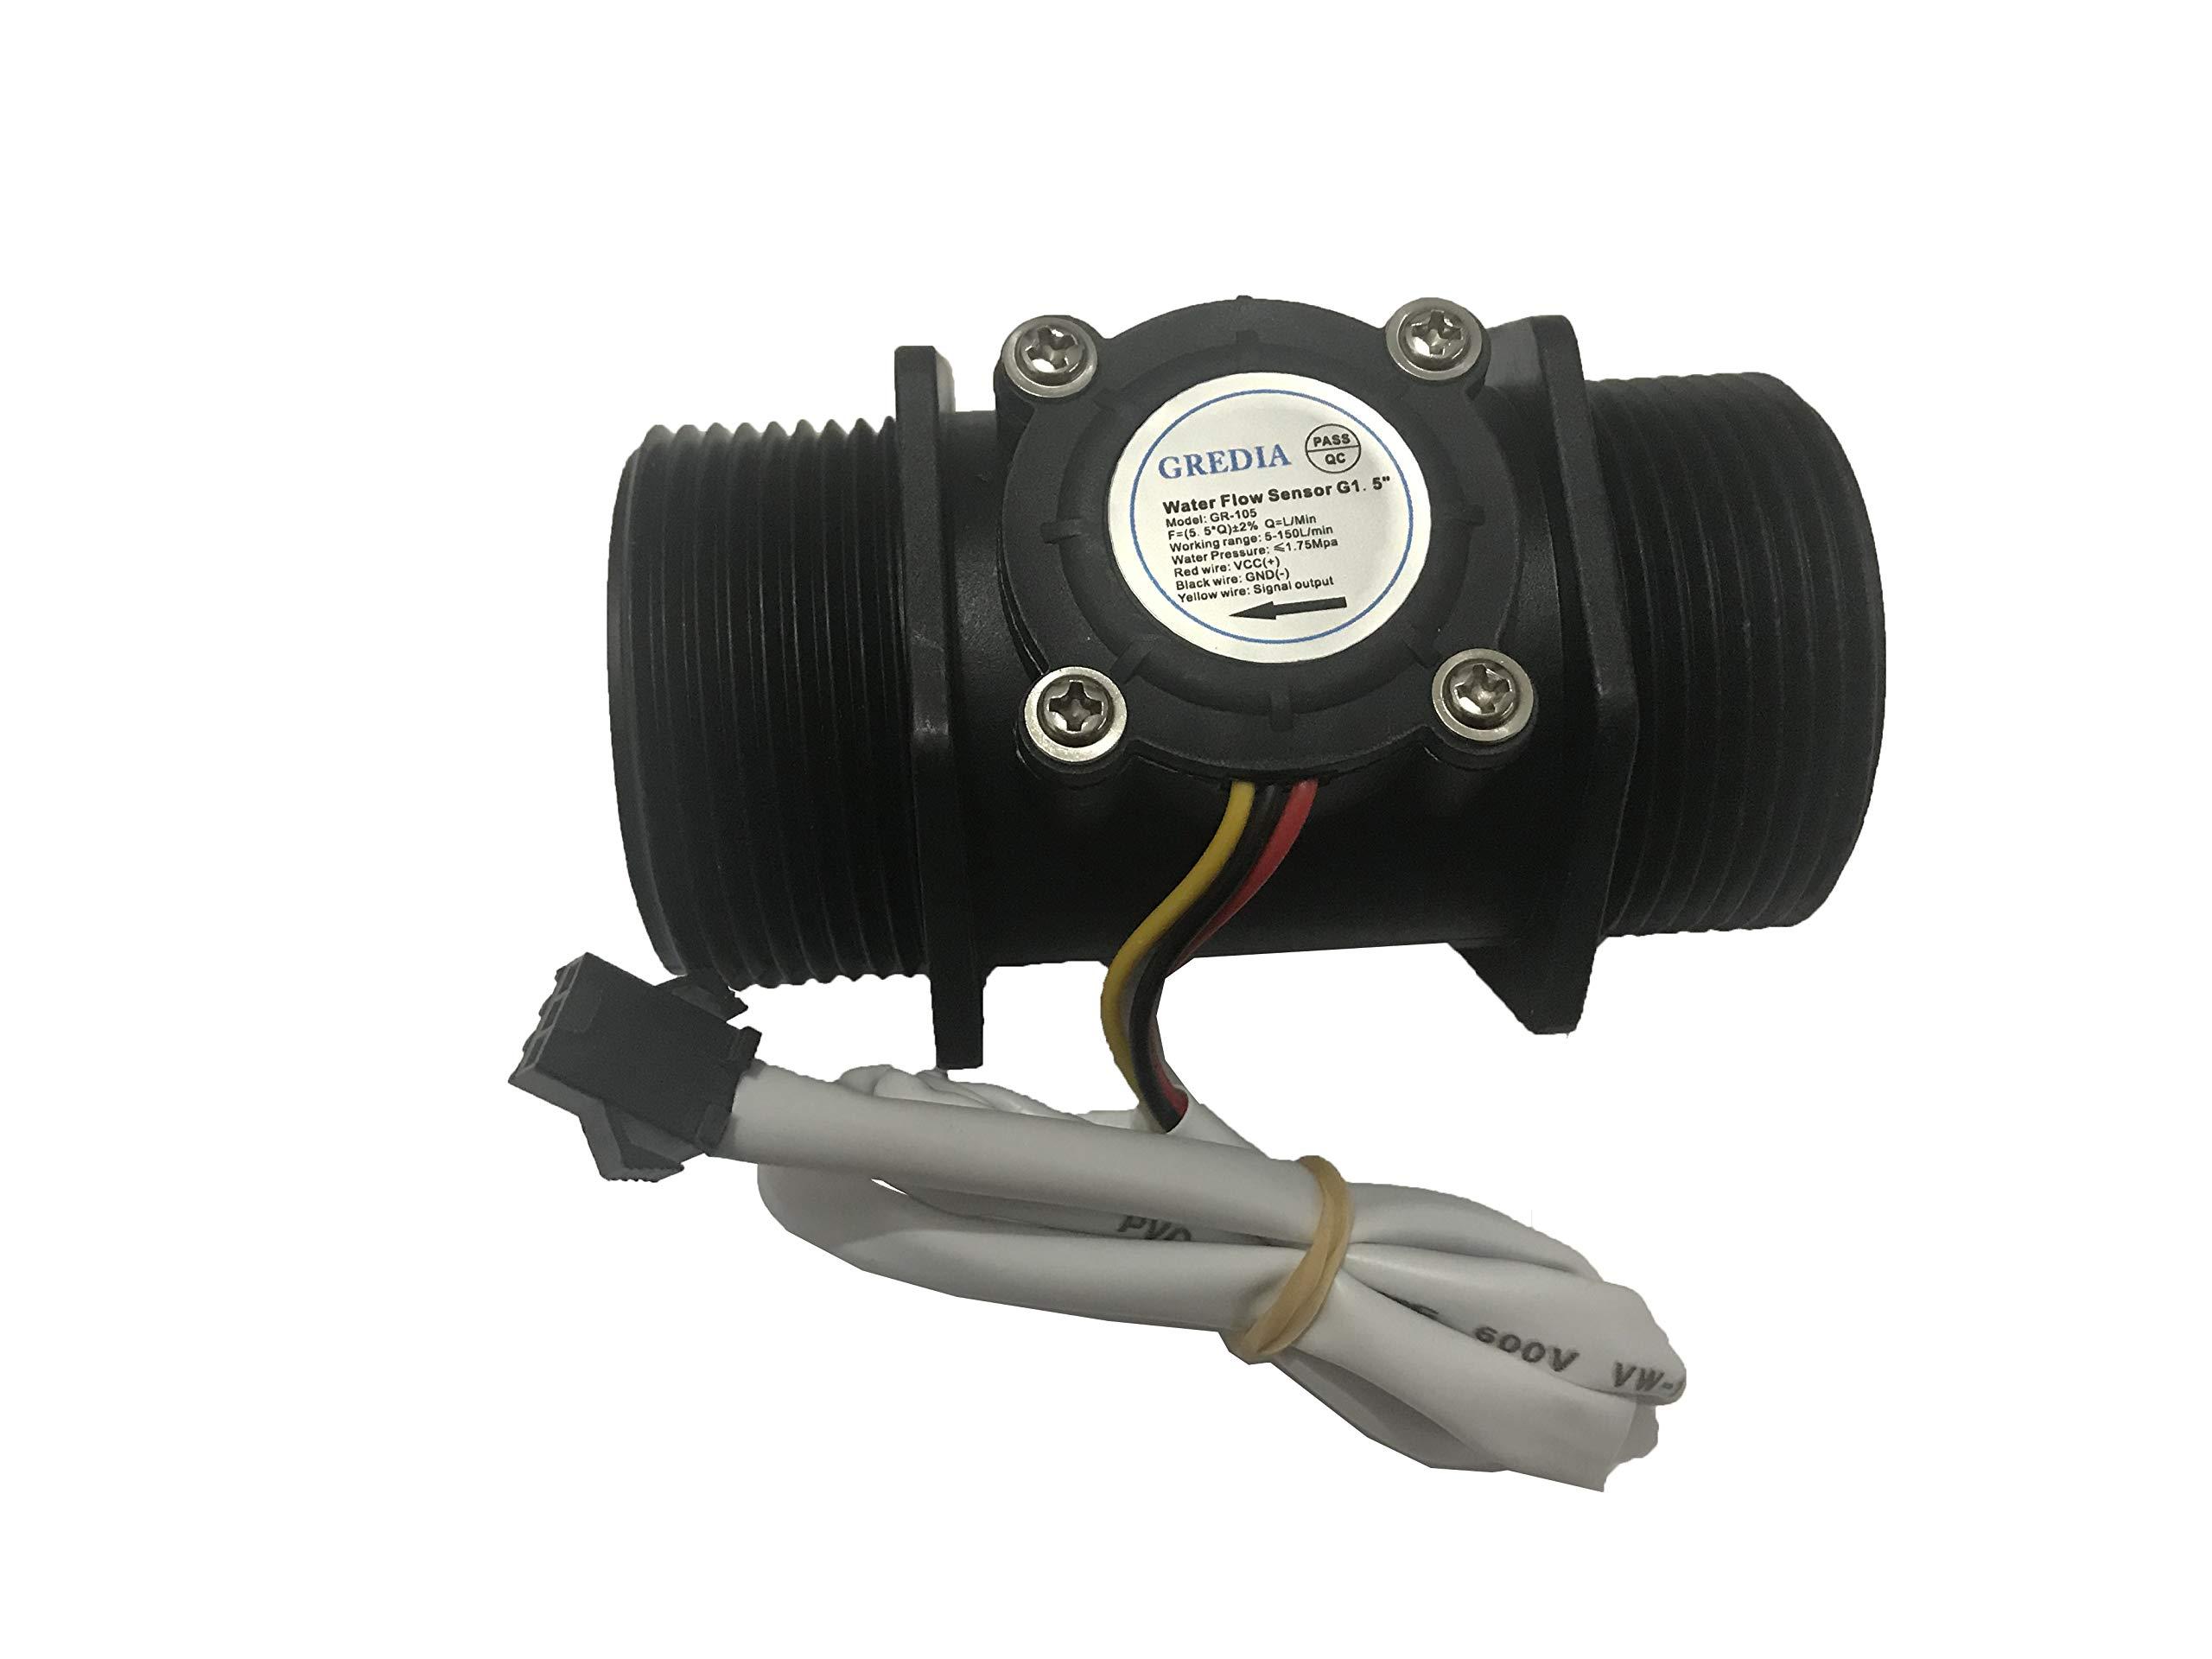 GREDIA G1-1/2'' 1.5'' Water Flow Sensor Food-Grade Switch Hall Effect Flowmeter Fluid Meter Counter 5-150L/min by GREDIA